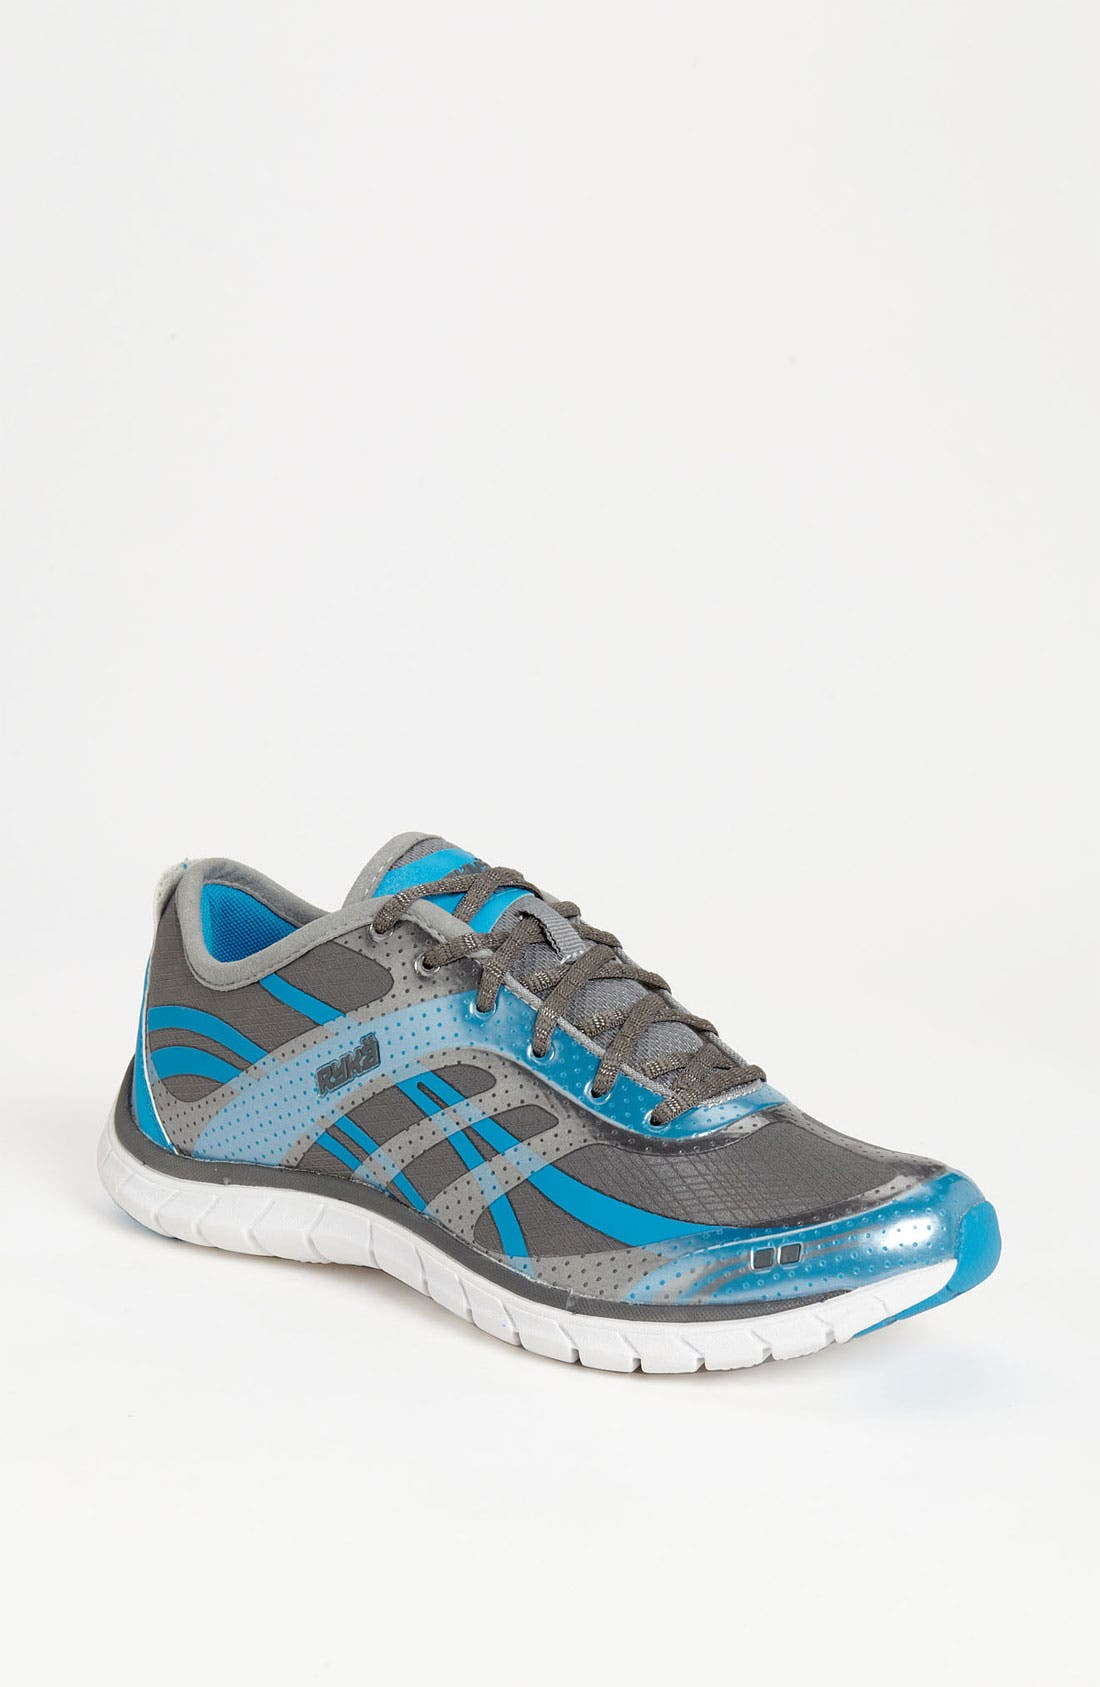 Main Image - rykä 'Hypnotic' Training Shoe (Women)